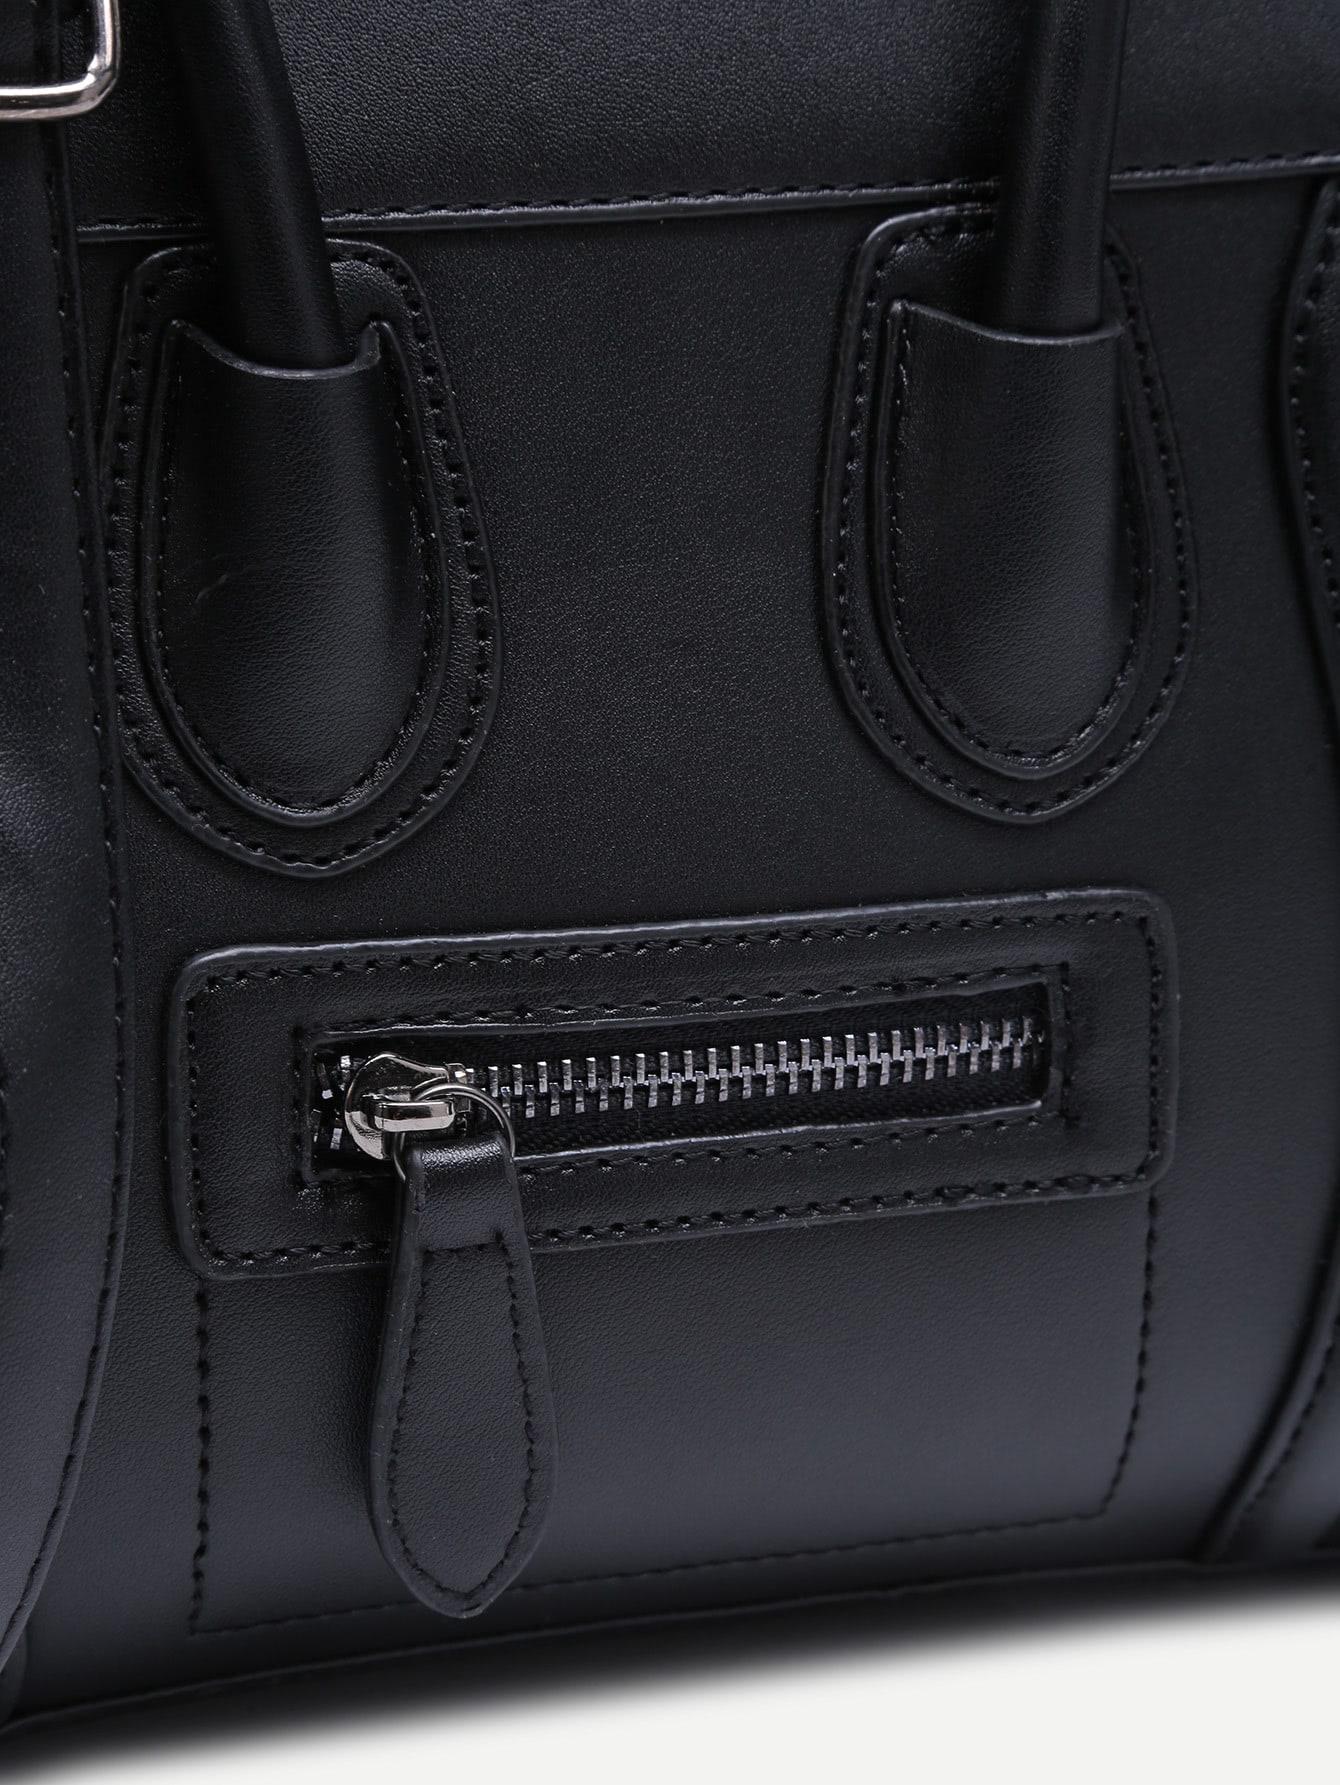 bag161101310_1